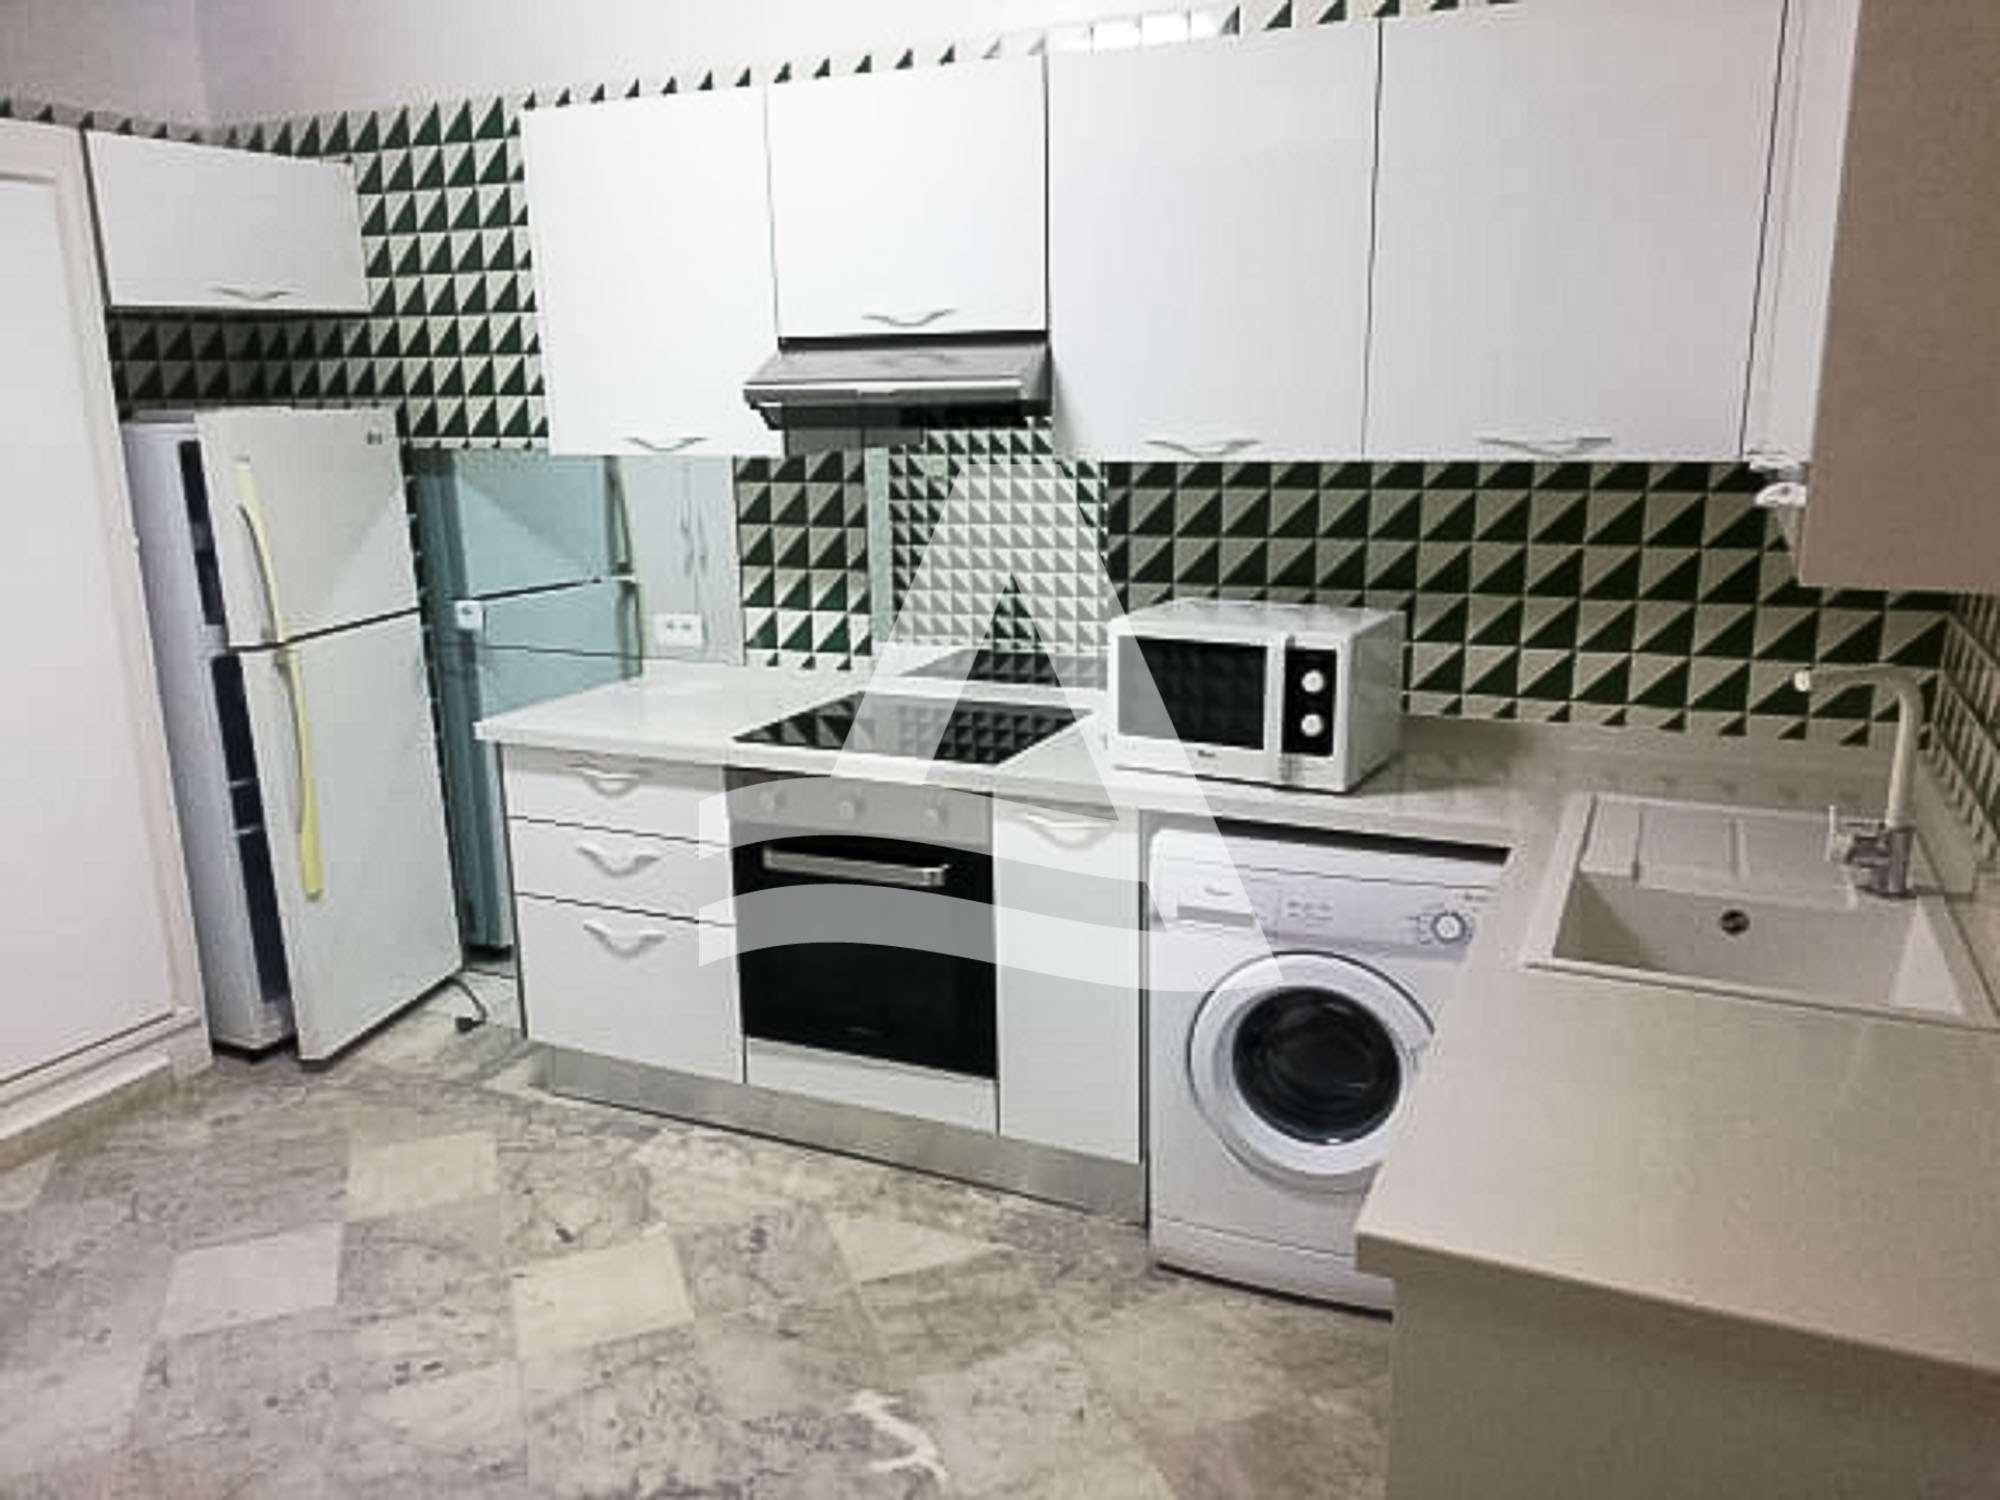 httpss3.amazonaws.comlogimoaws_Arcane_immobilière_la_Marsa-_location_-_vente_la_marsa_2_sur_2_1574336514674